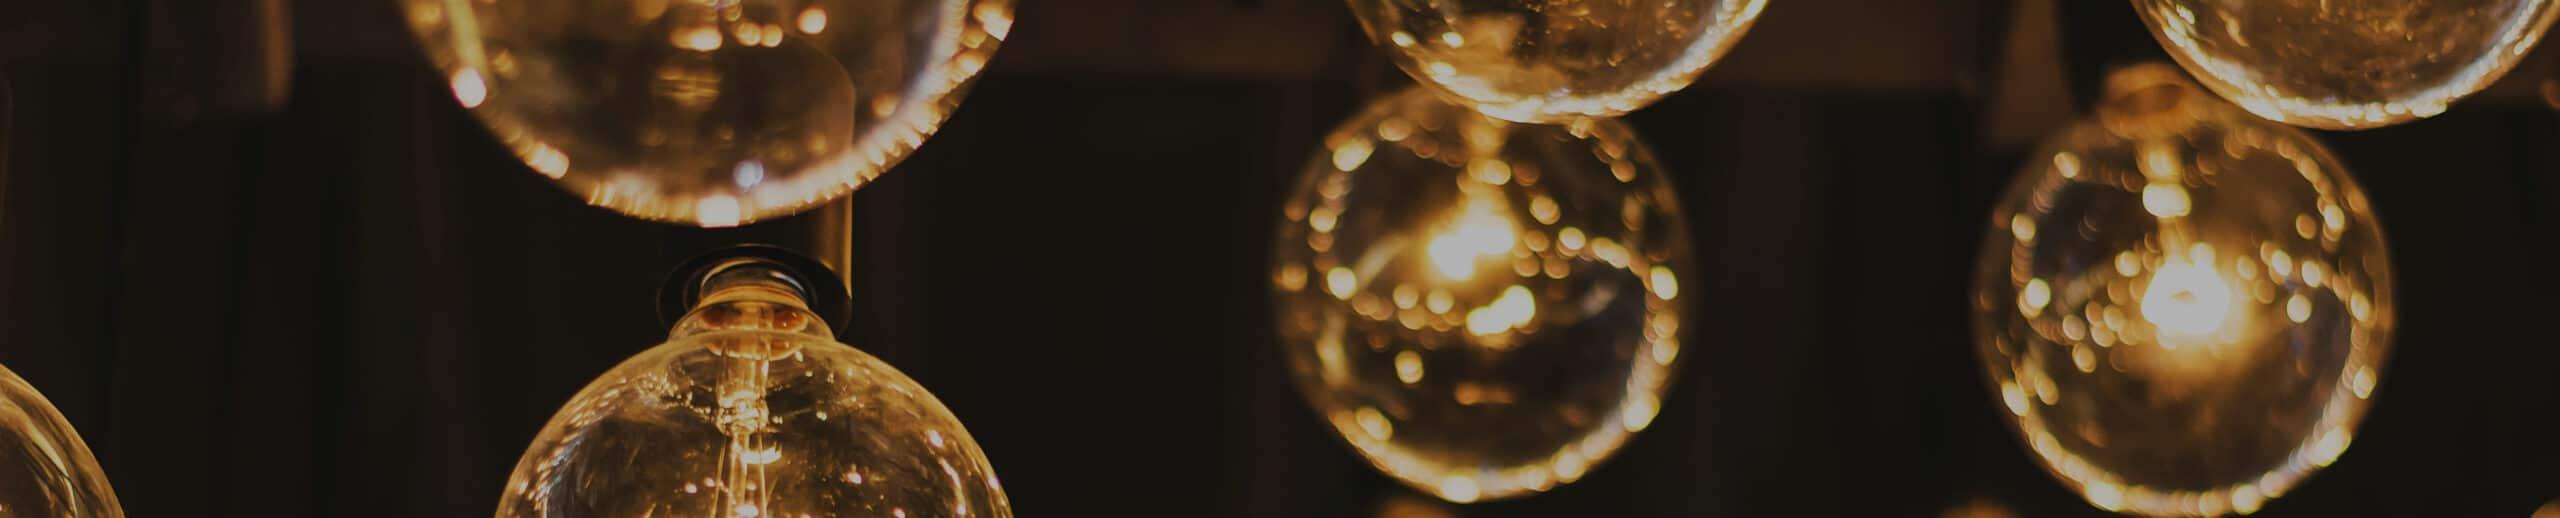 Loop Electriclal lightbulbs